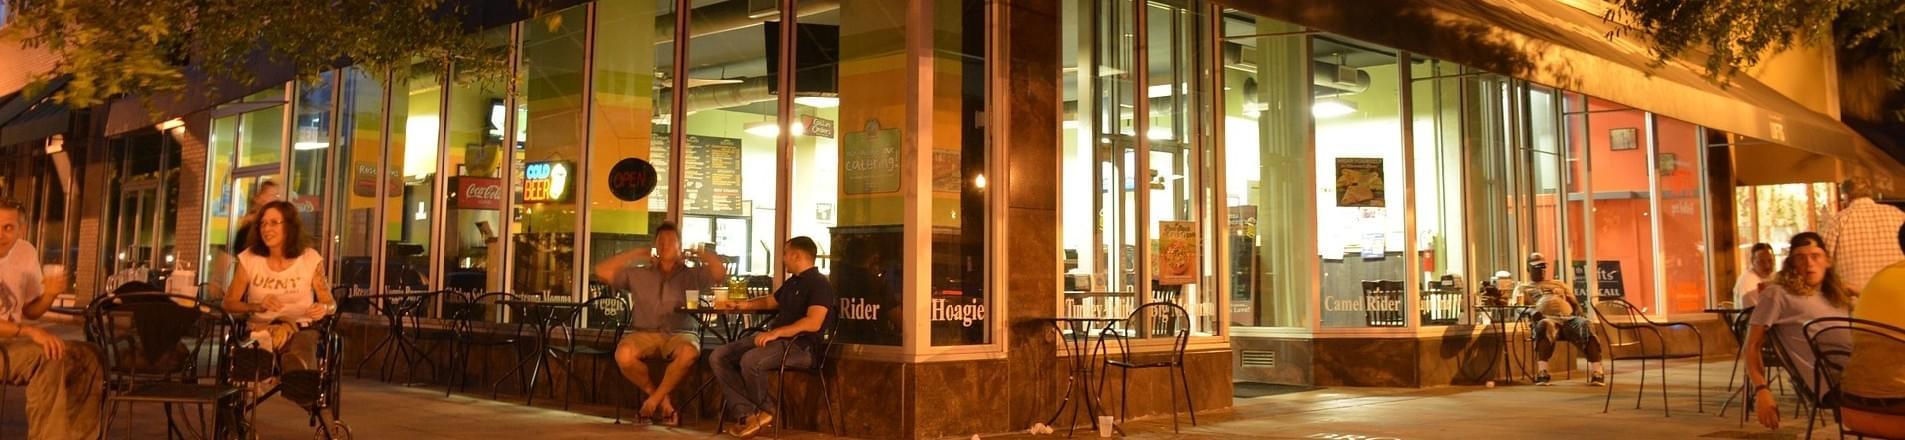 My Story: The Disability Café